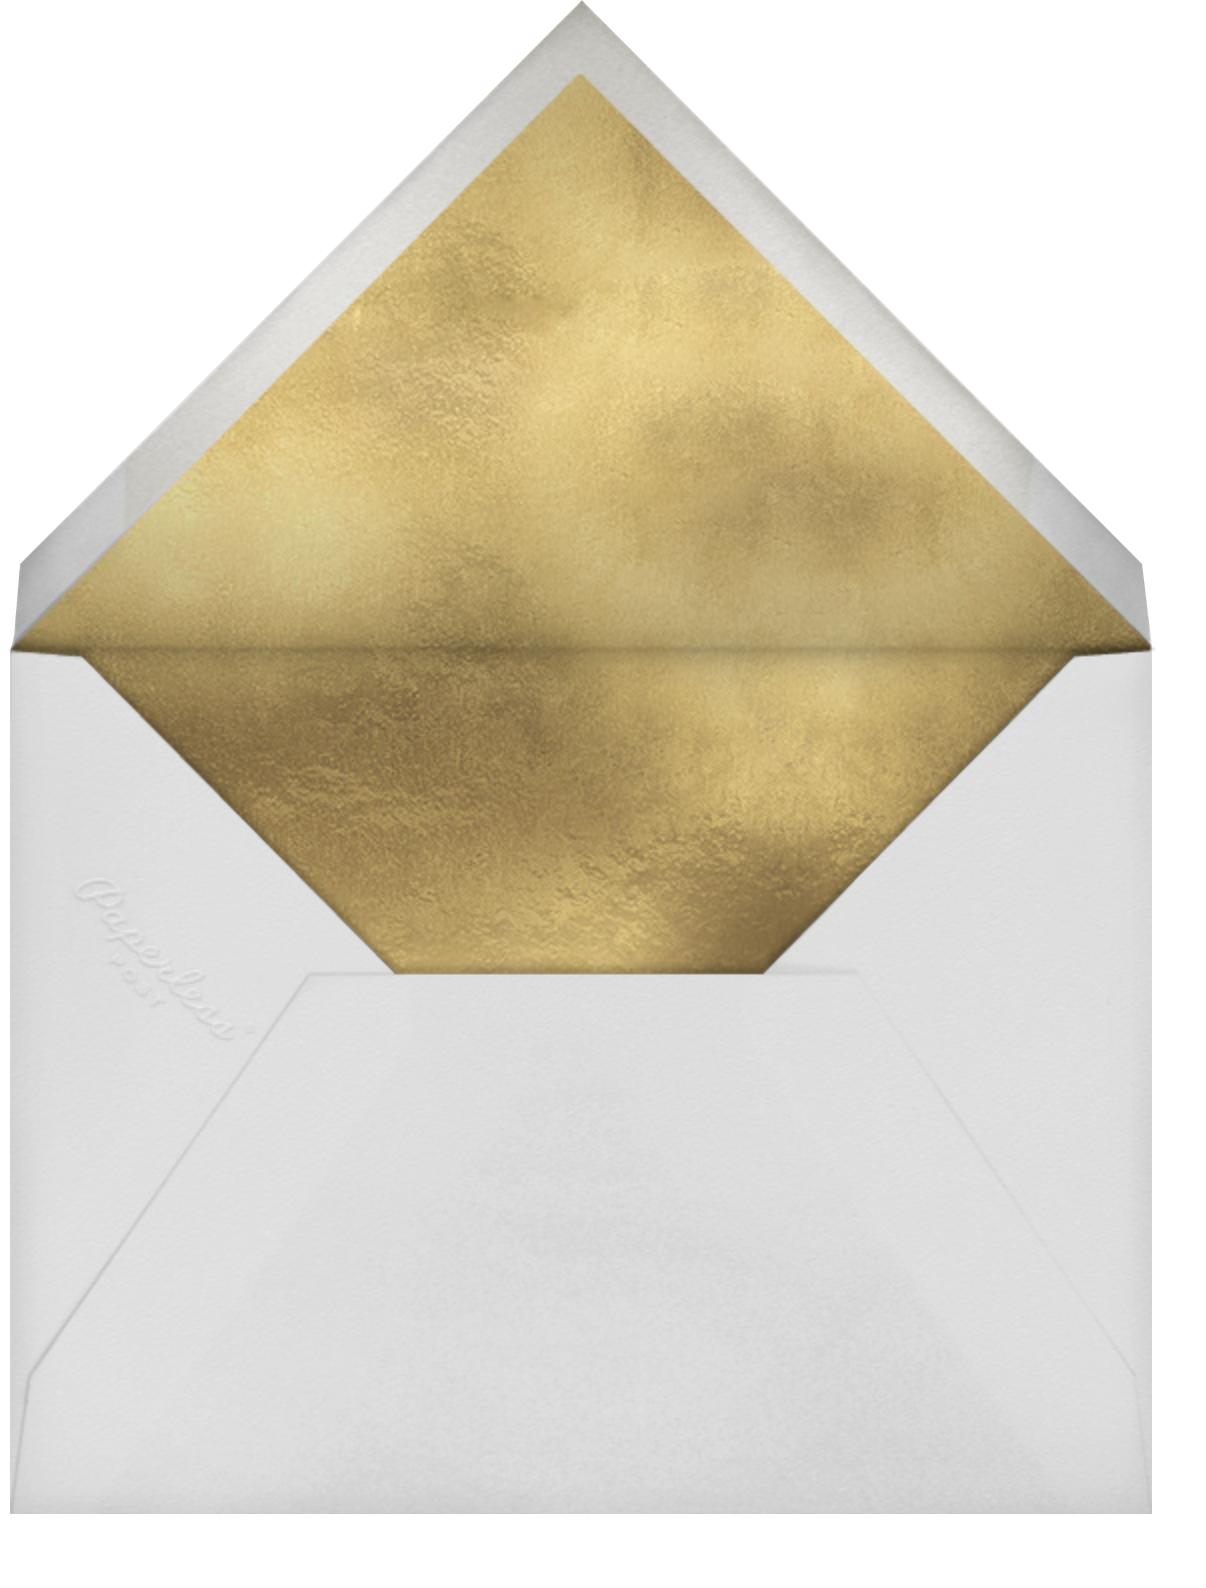 Best of Luck - Rifle Paper Co. - Encouragement - envelope back